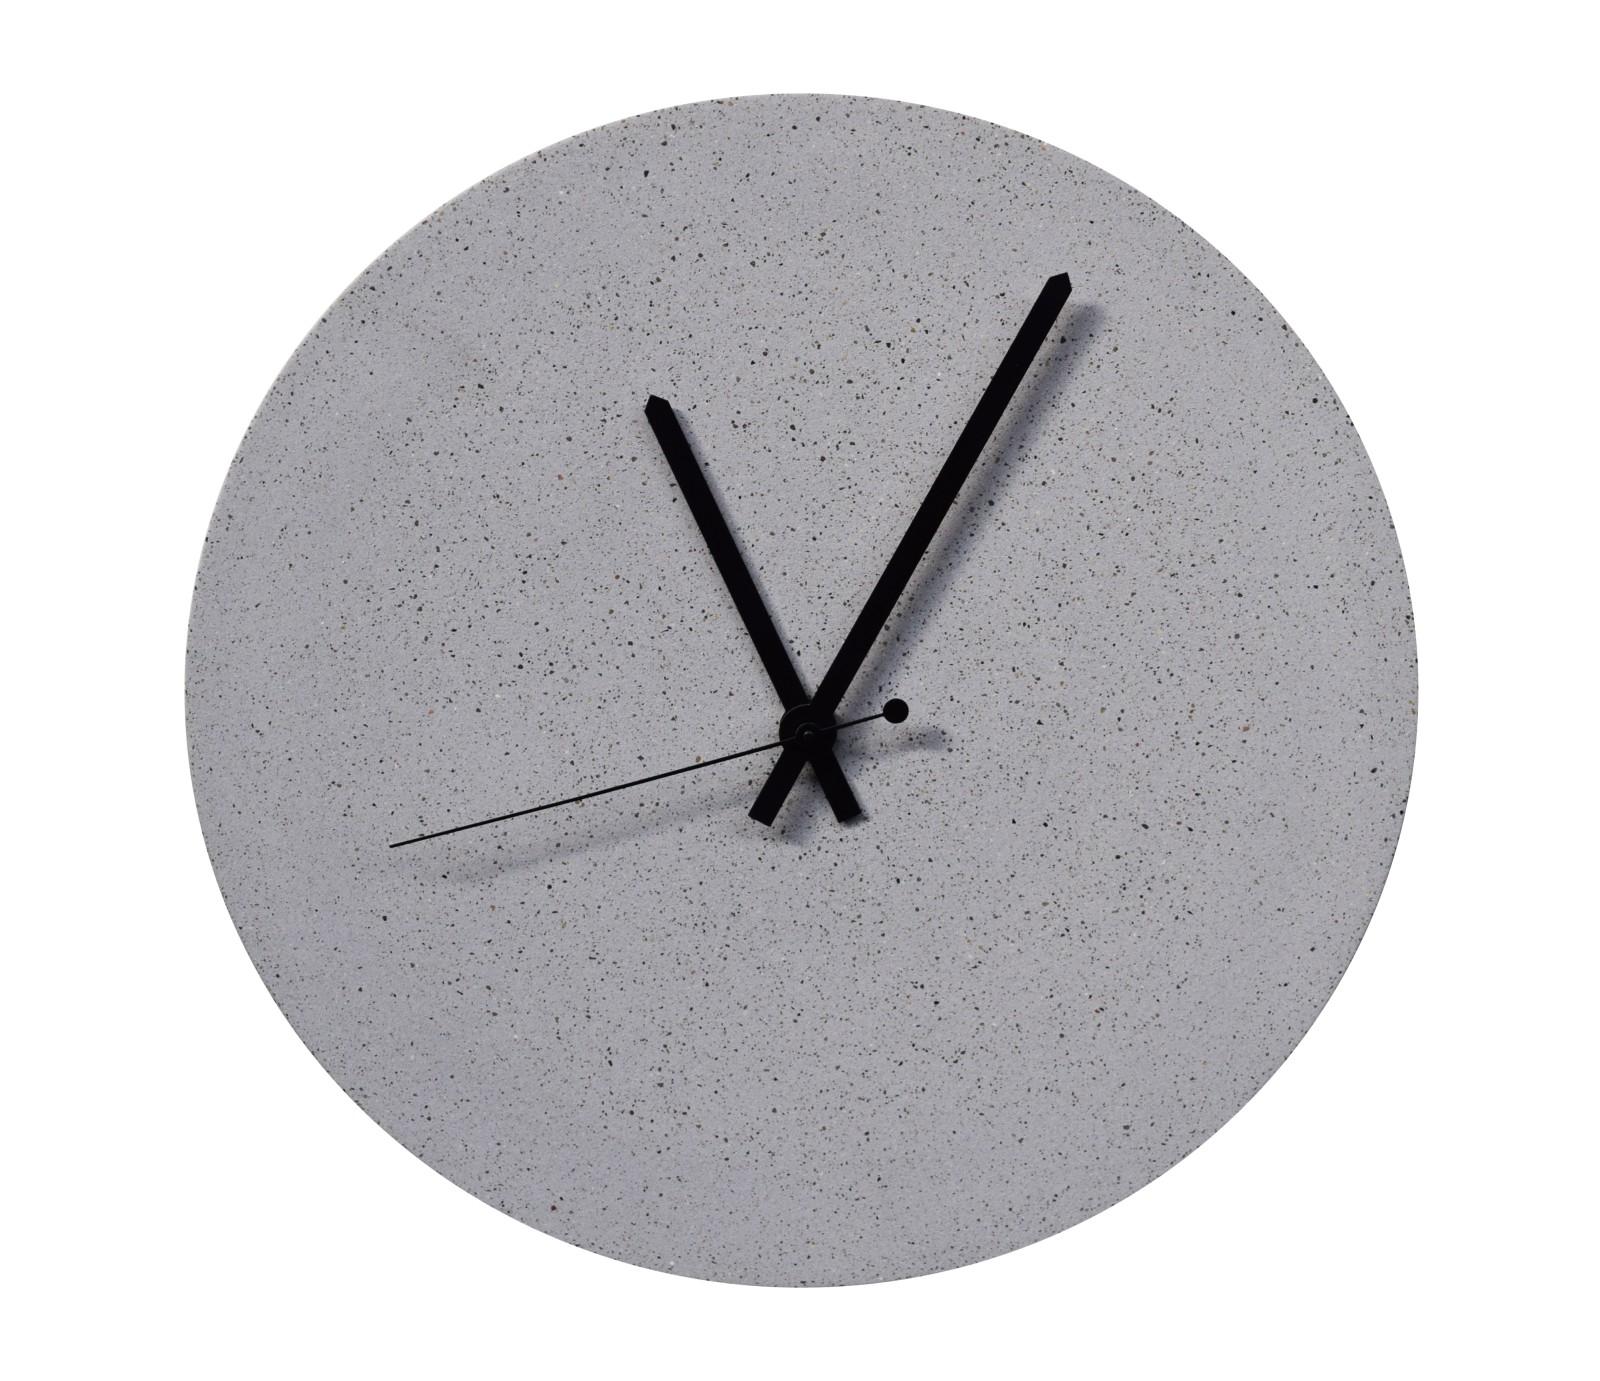 TEMPUS 32 concrete wall clock grey sand